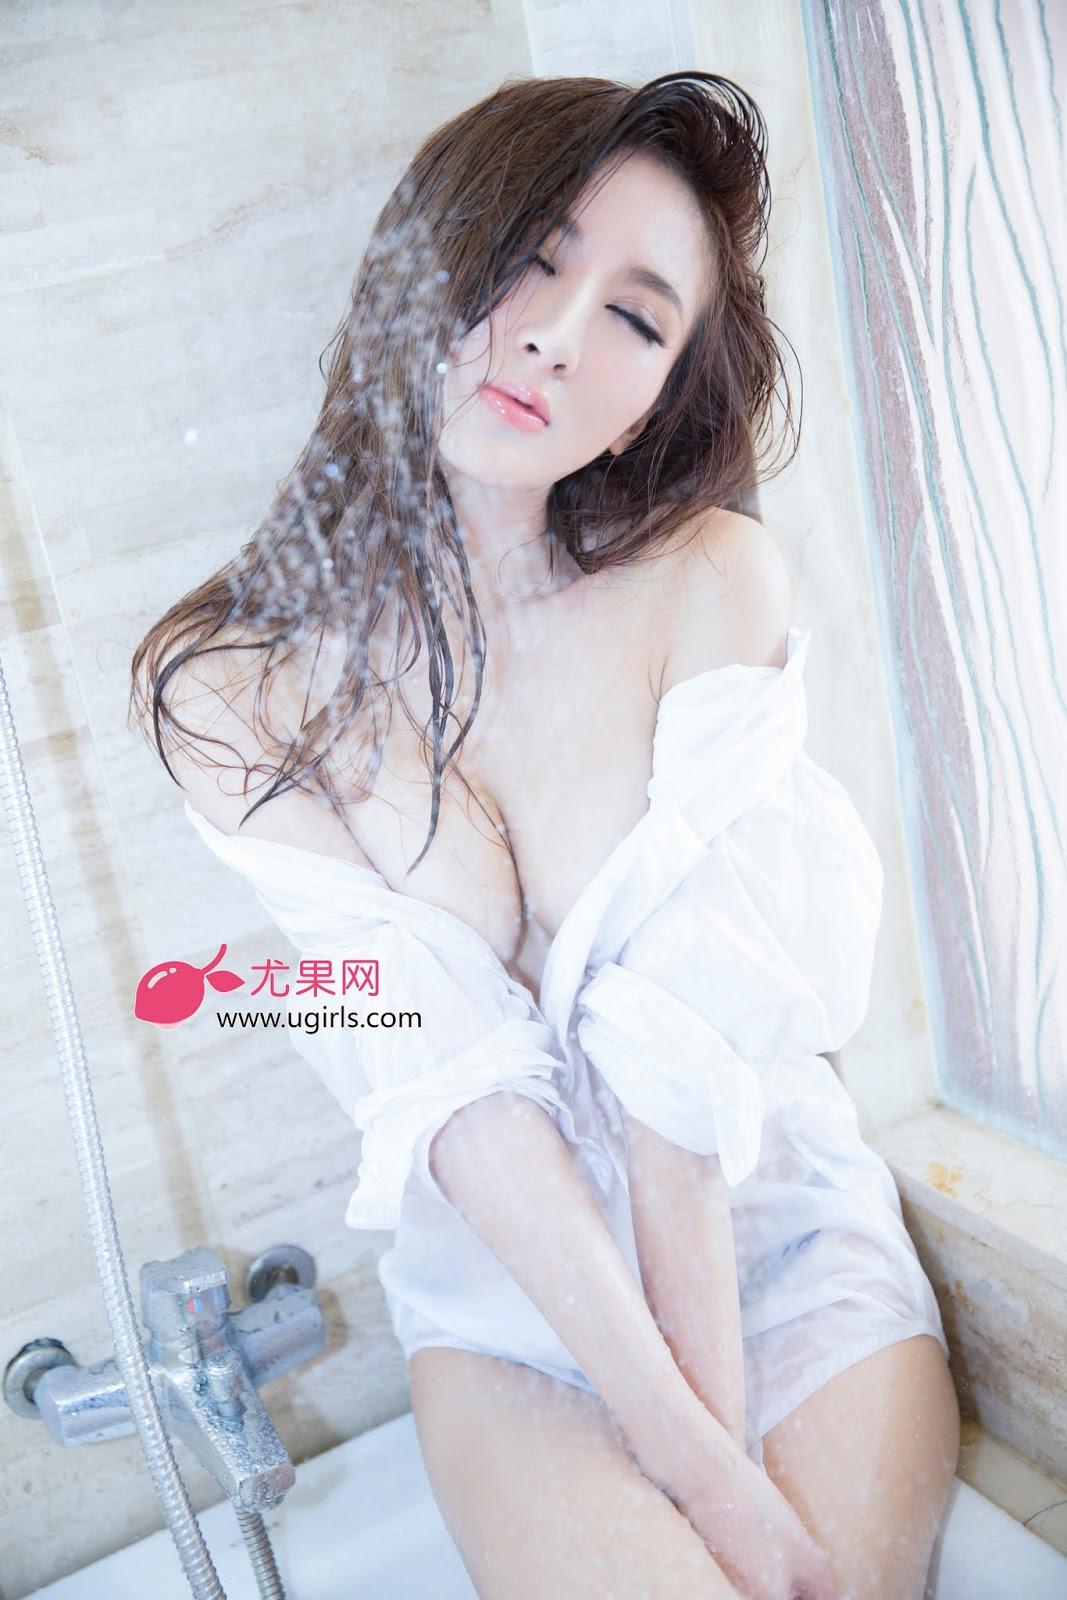 A14A6882 - Hot Photo UGIRLS NO.6 Nude Girl